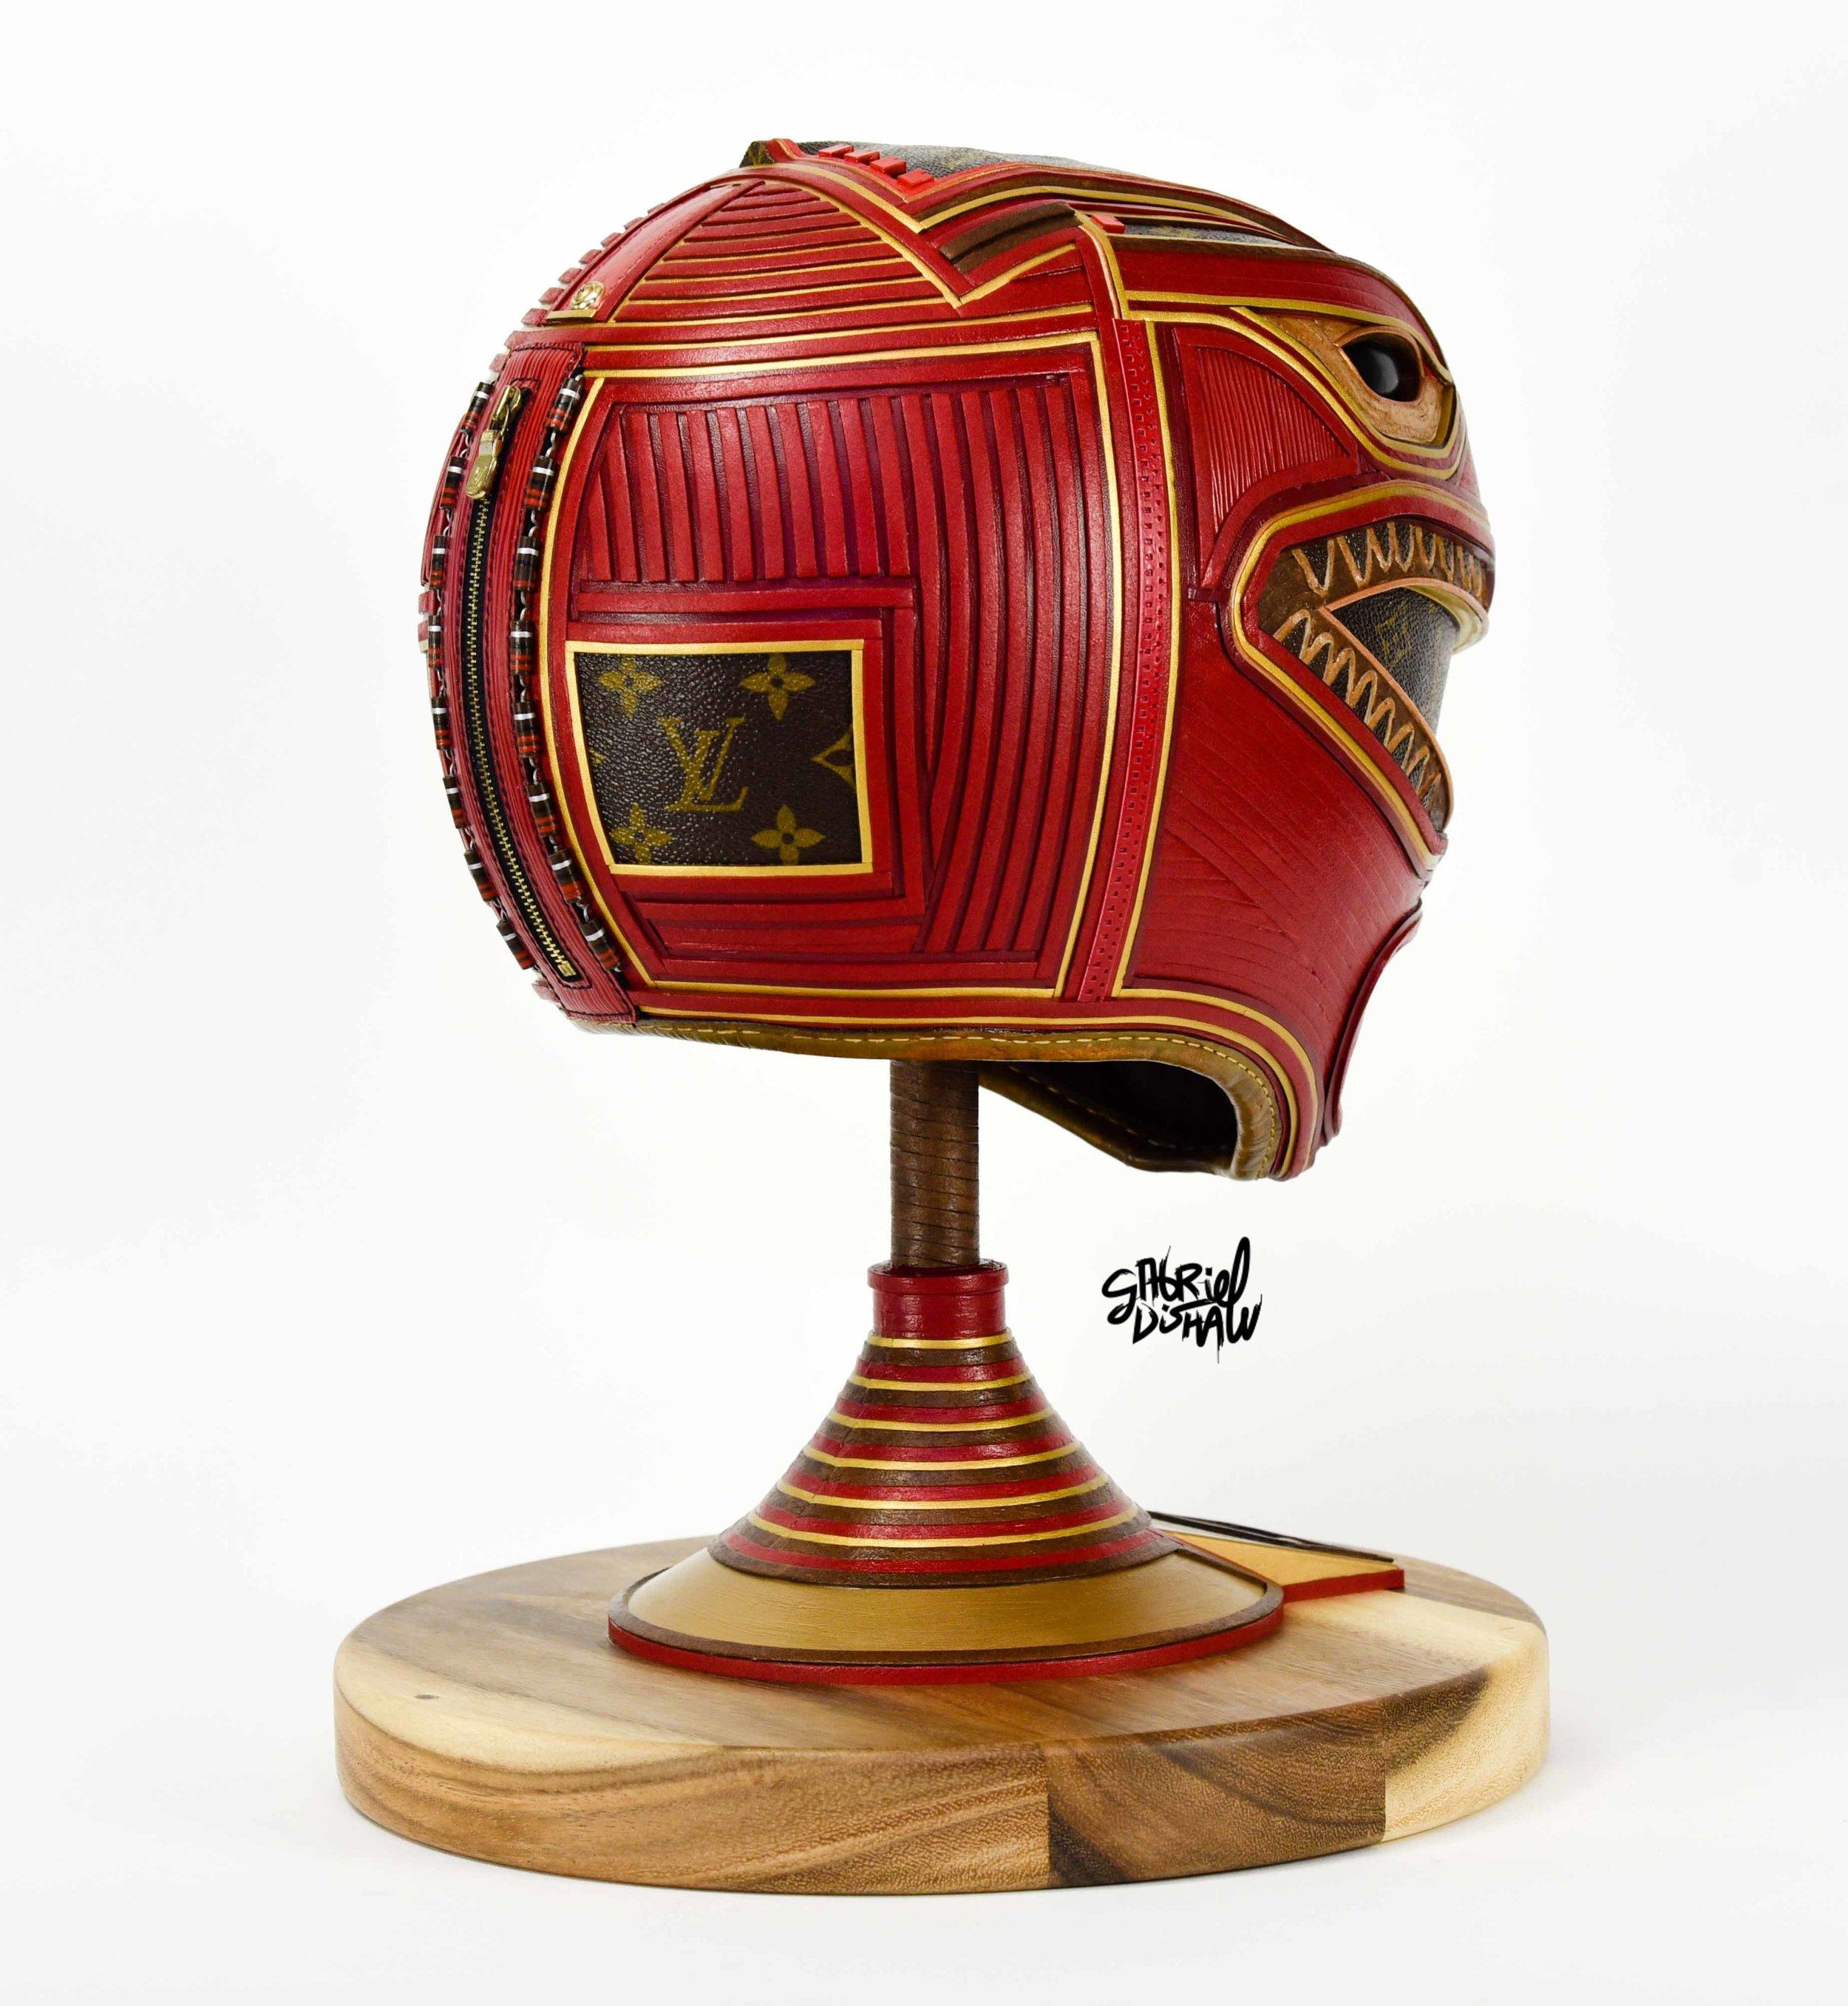 Gabriel Dishaw LV Red Ranger-3387.jpg